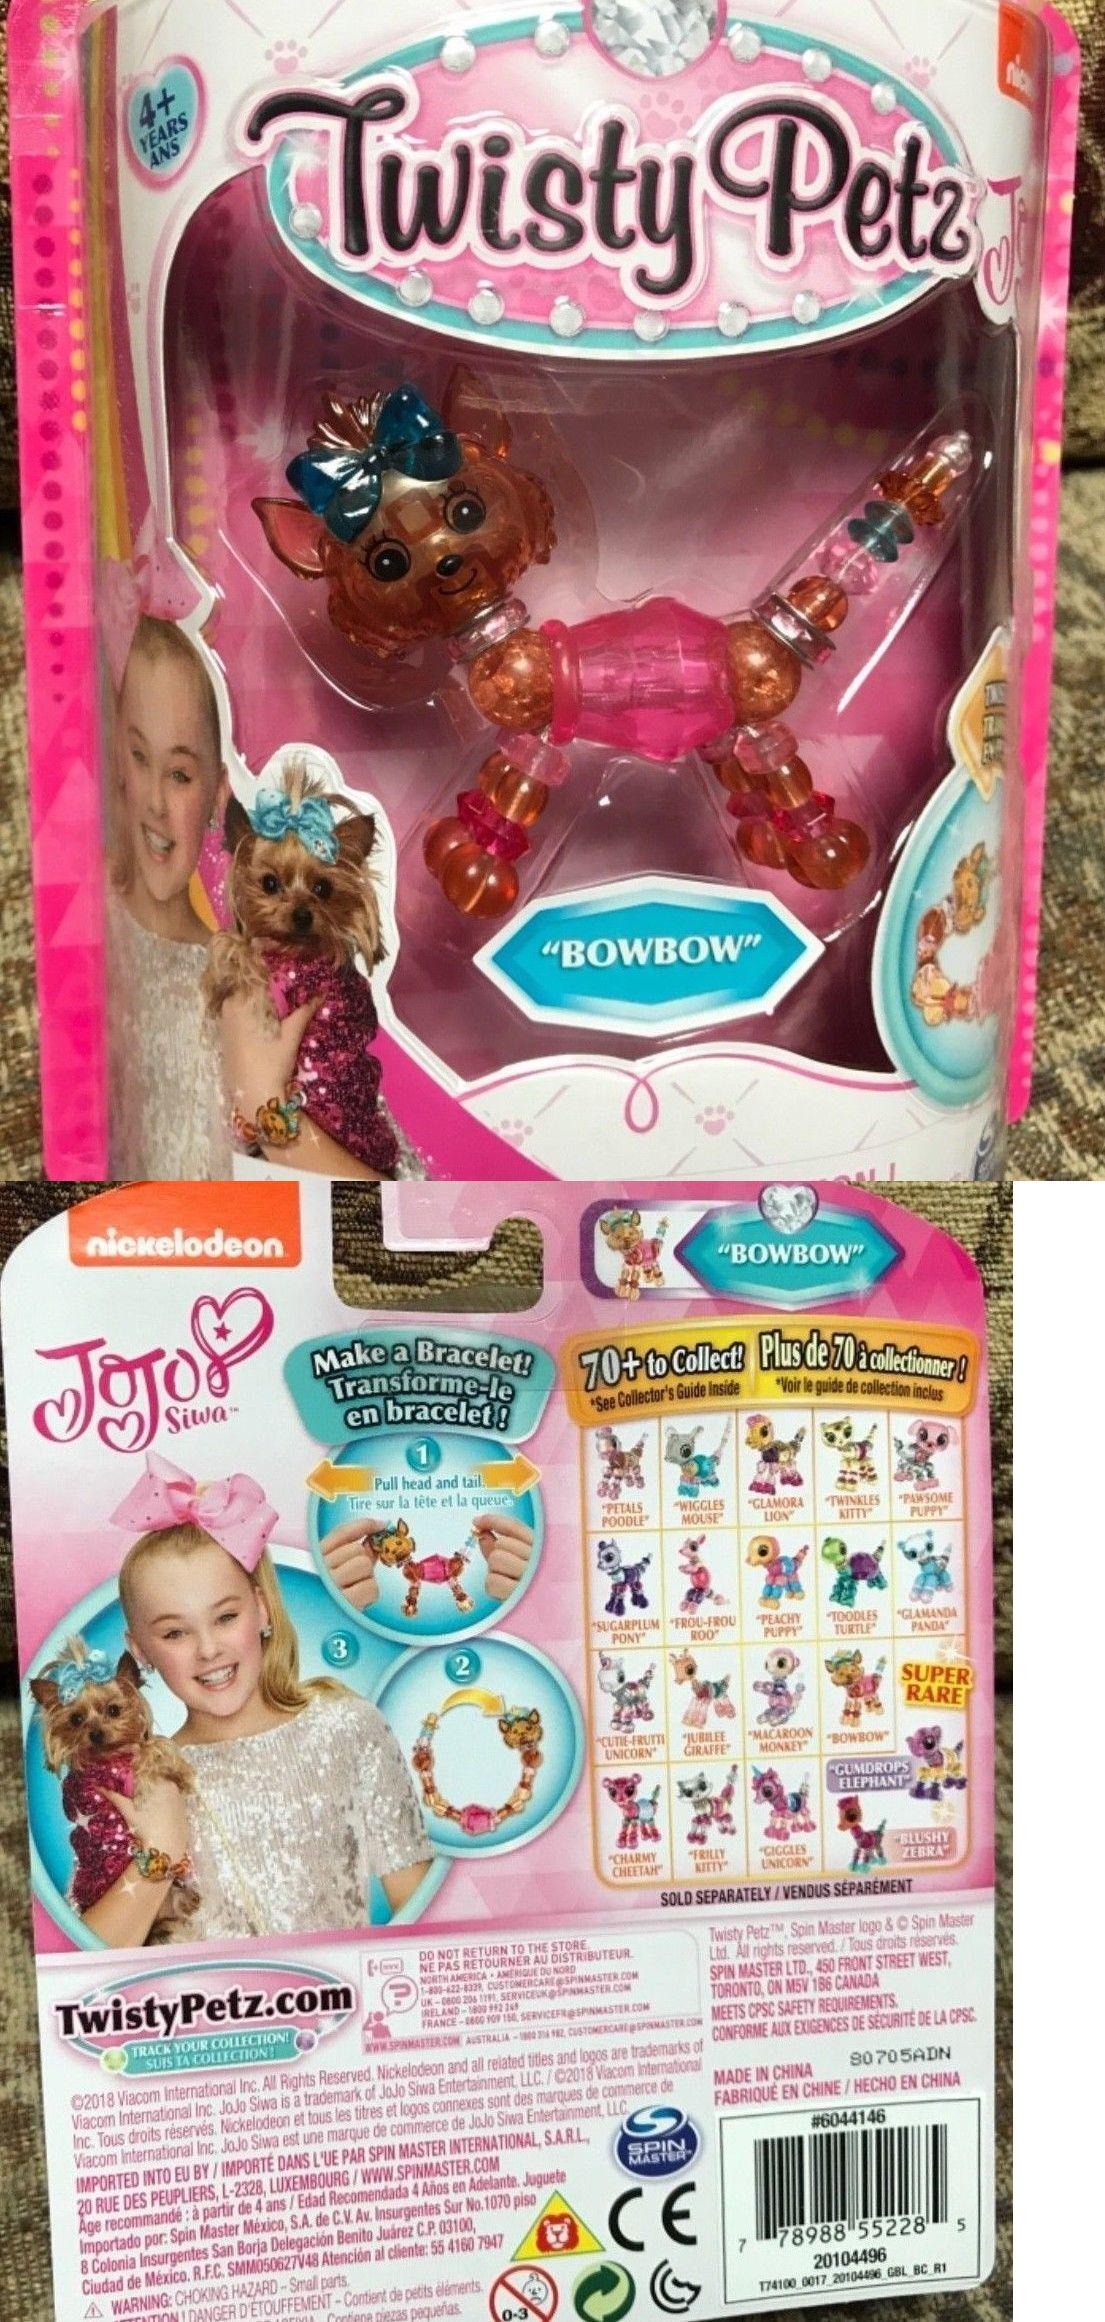 Action Figures Twisty Petz Pets Super Rare Jojo Siwa Bow Bowbow Transform Pet To Bracelet Rare Clothing, Shoes & Accessories